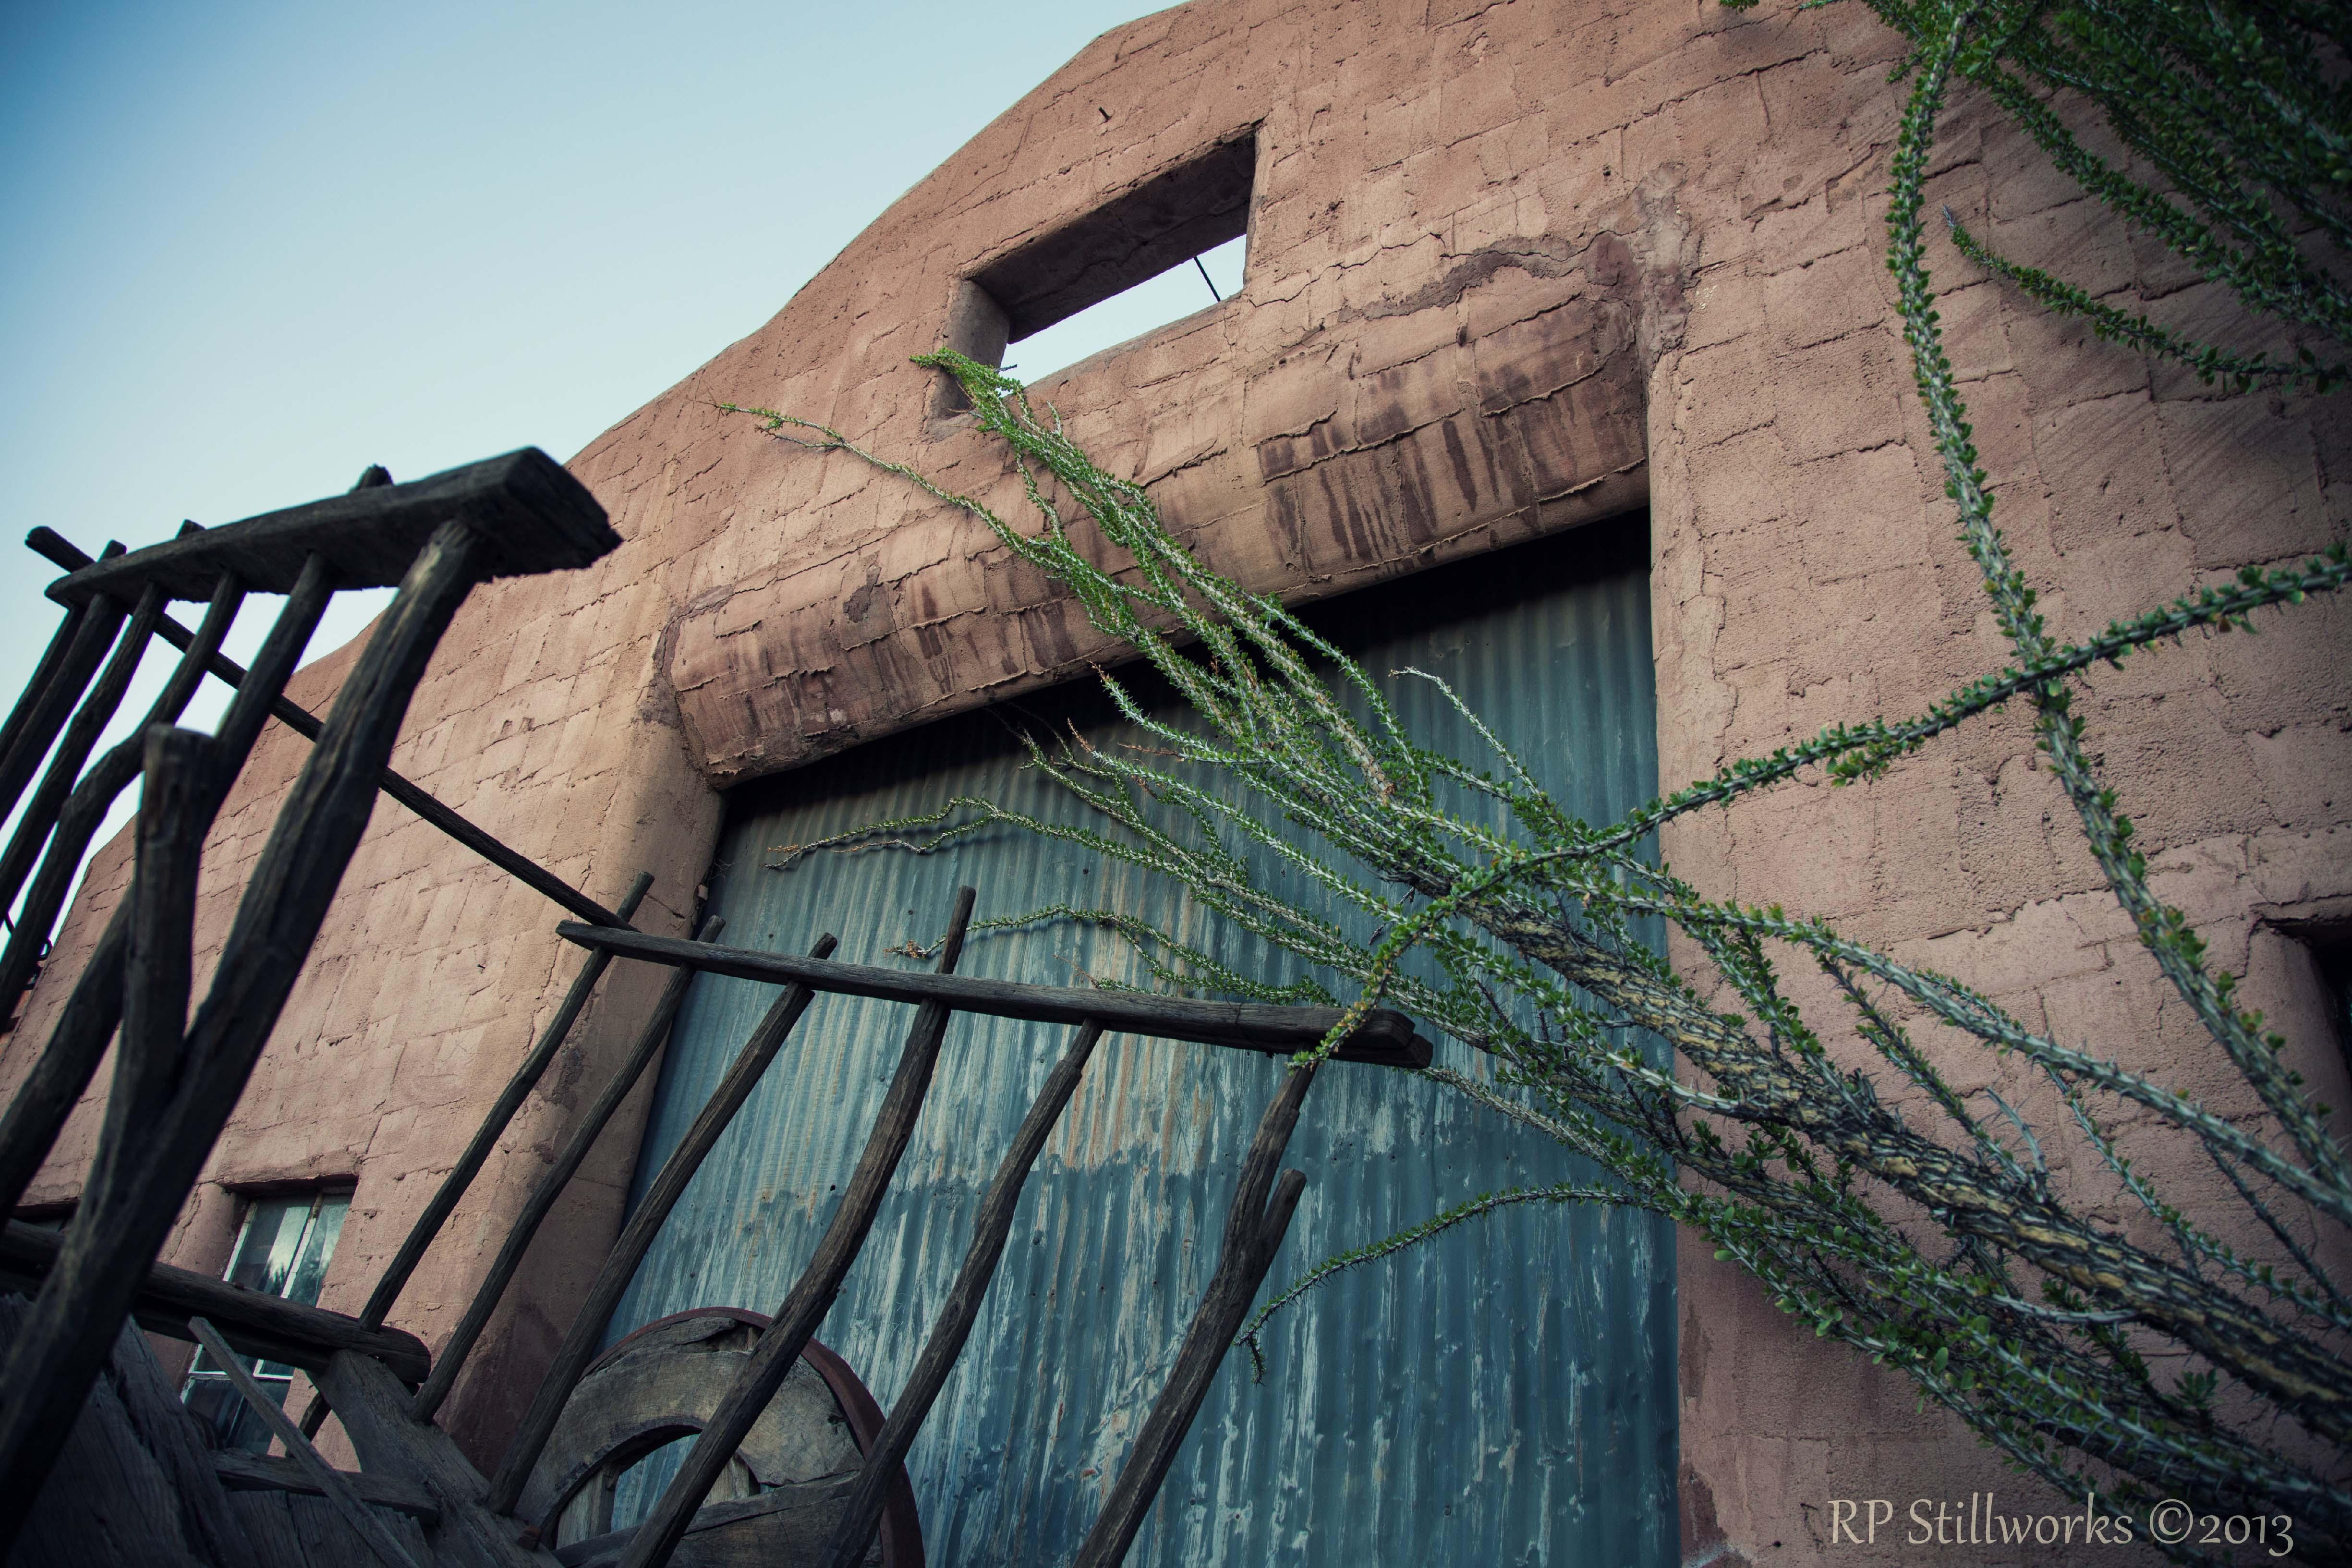 So Old Scottsdale!